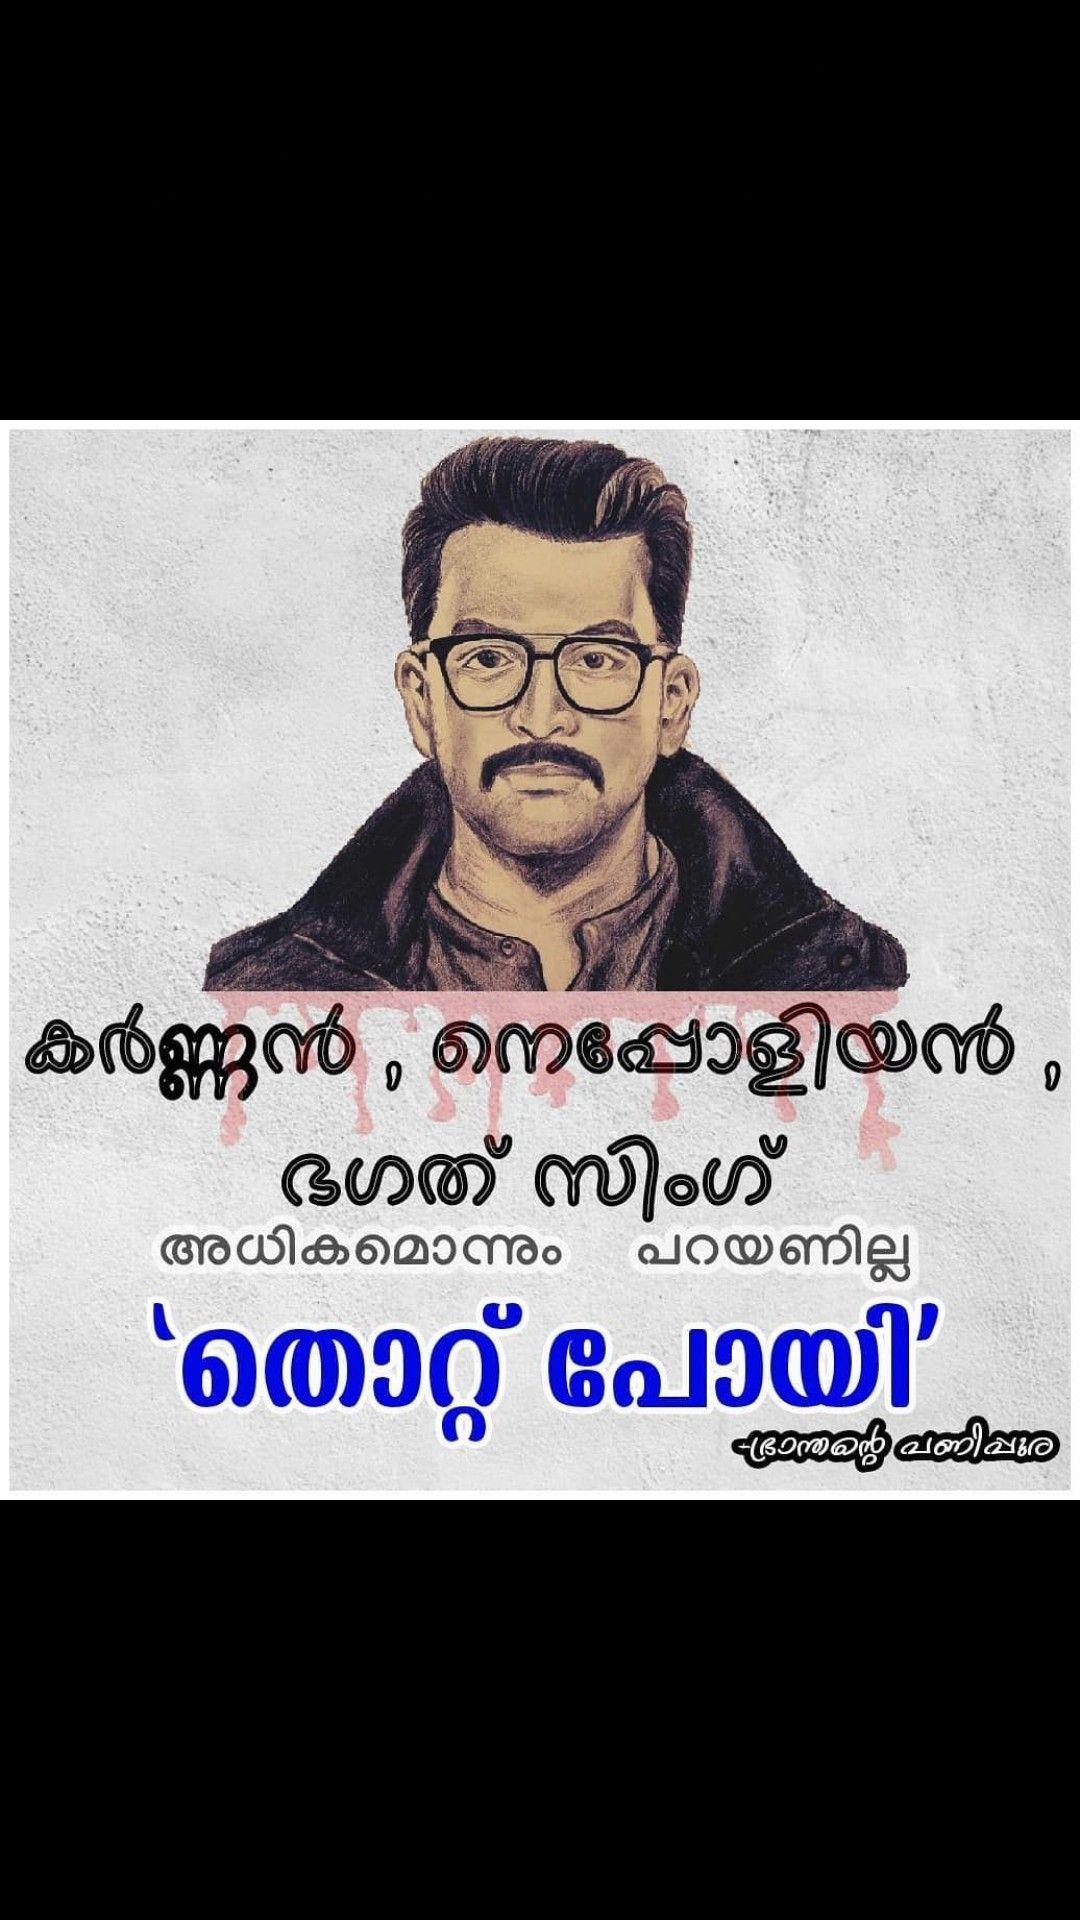 Thott Poyi Funny Dialogues Badass Quotes Malayalam Quotes